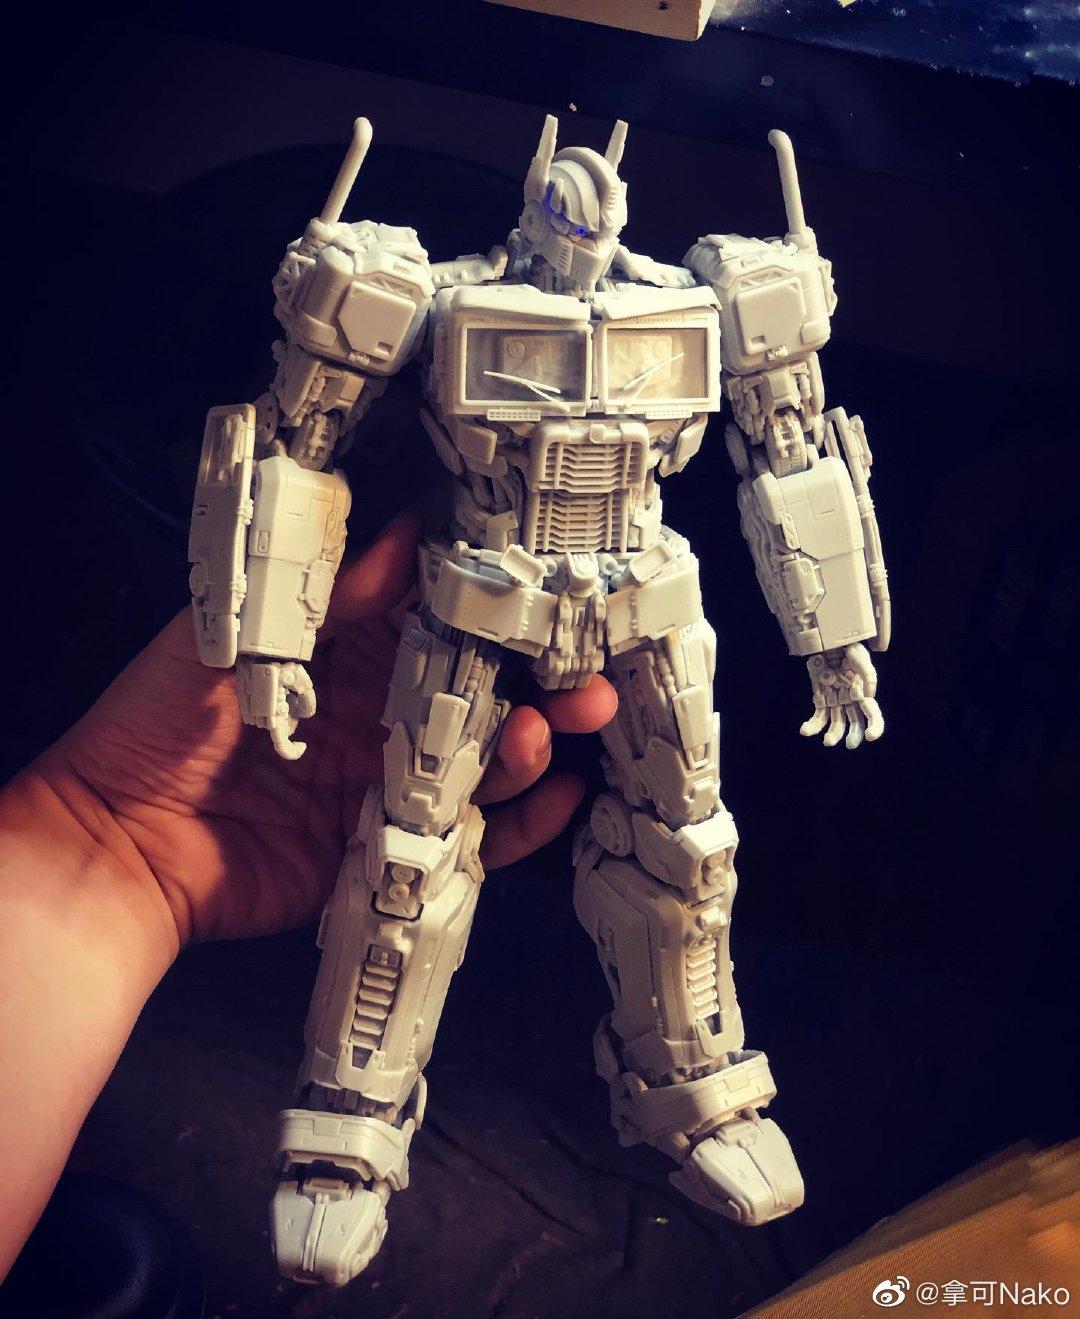 G798_NakoMake_Optimus_Prime_BUMBLEBEE_ver_GK_001.jpg